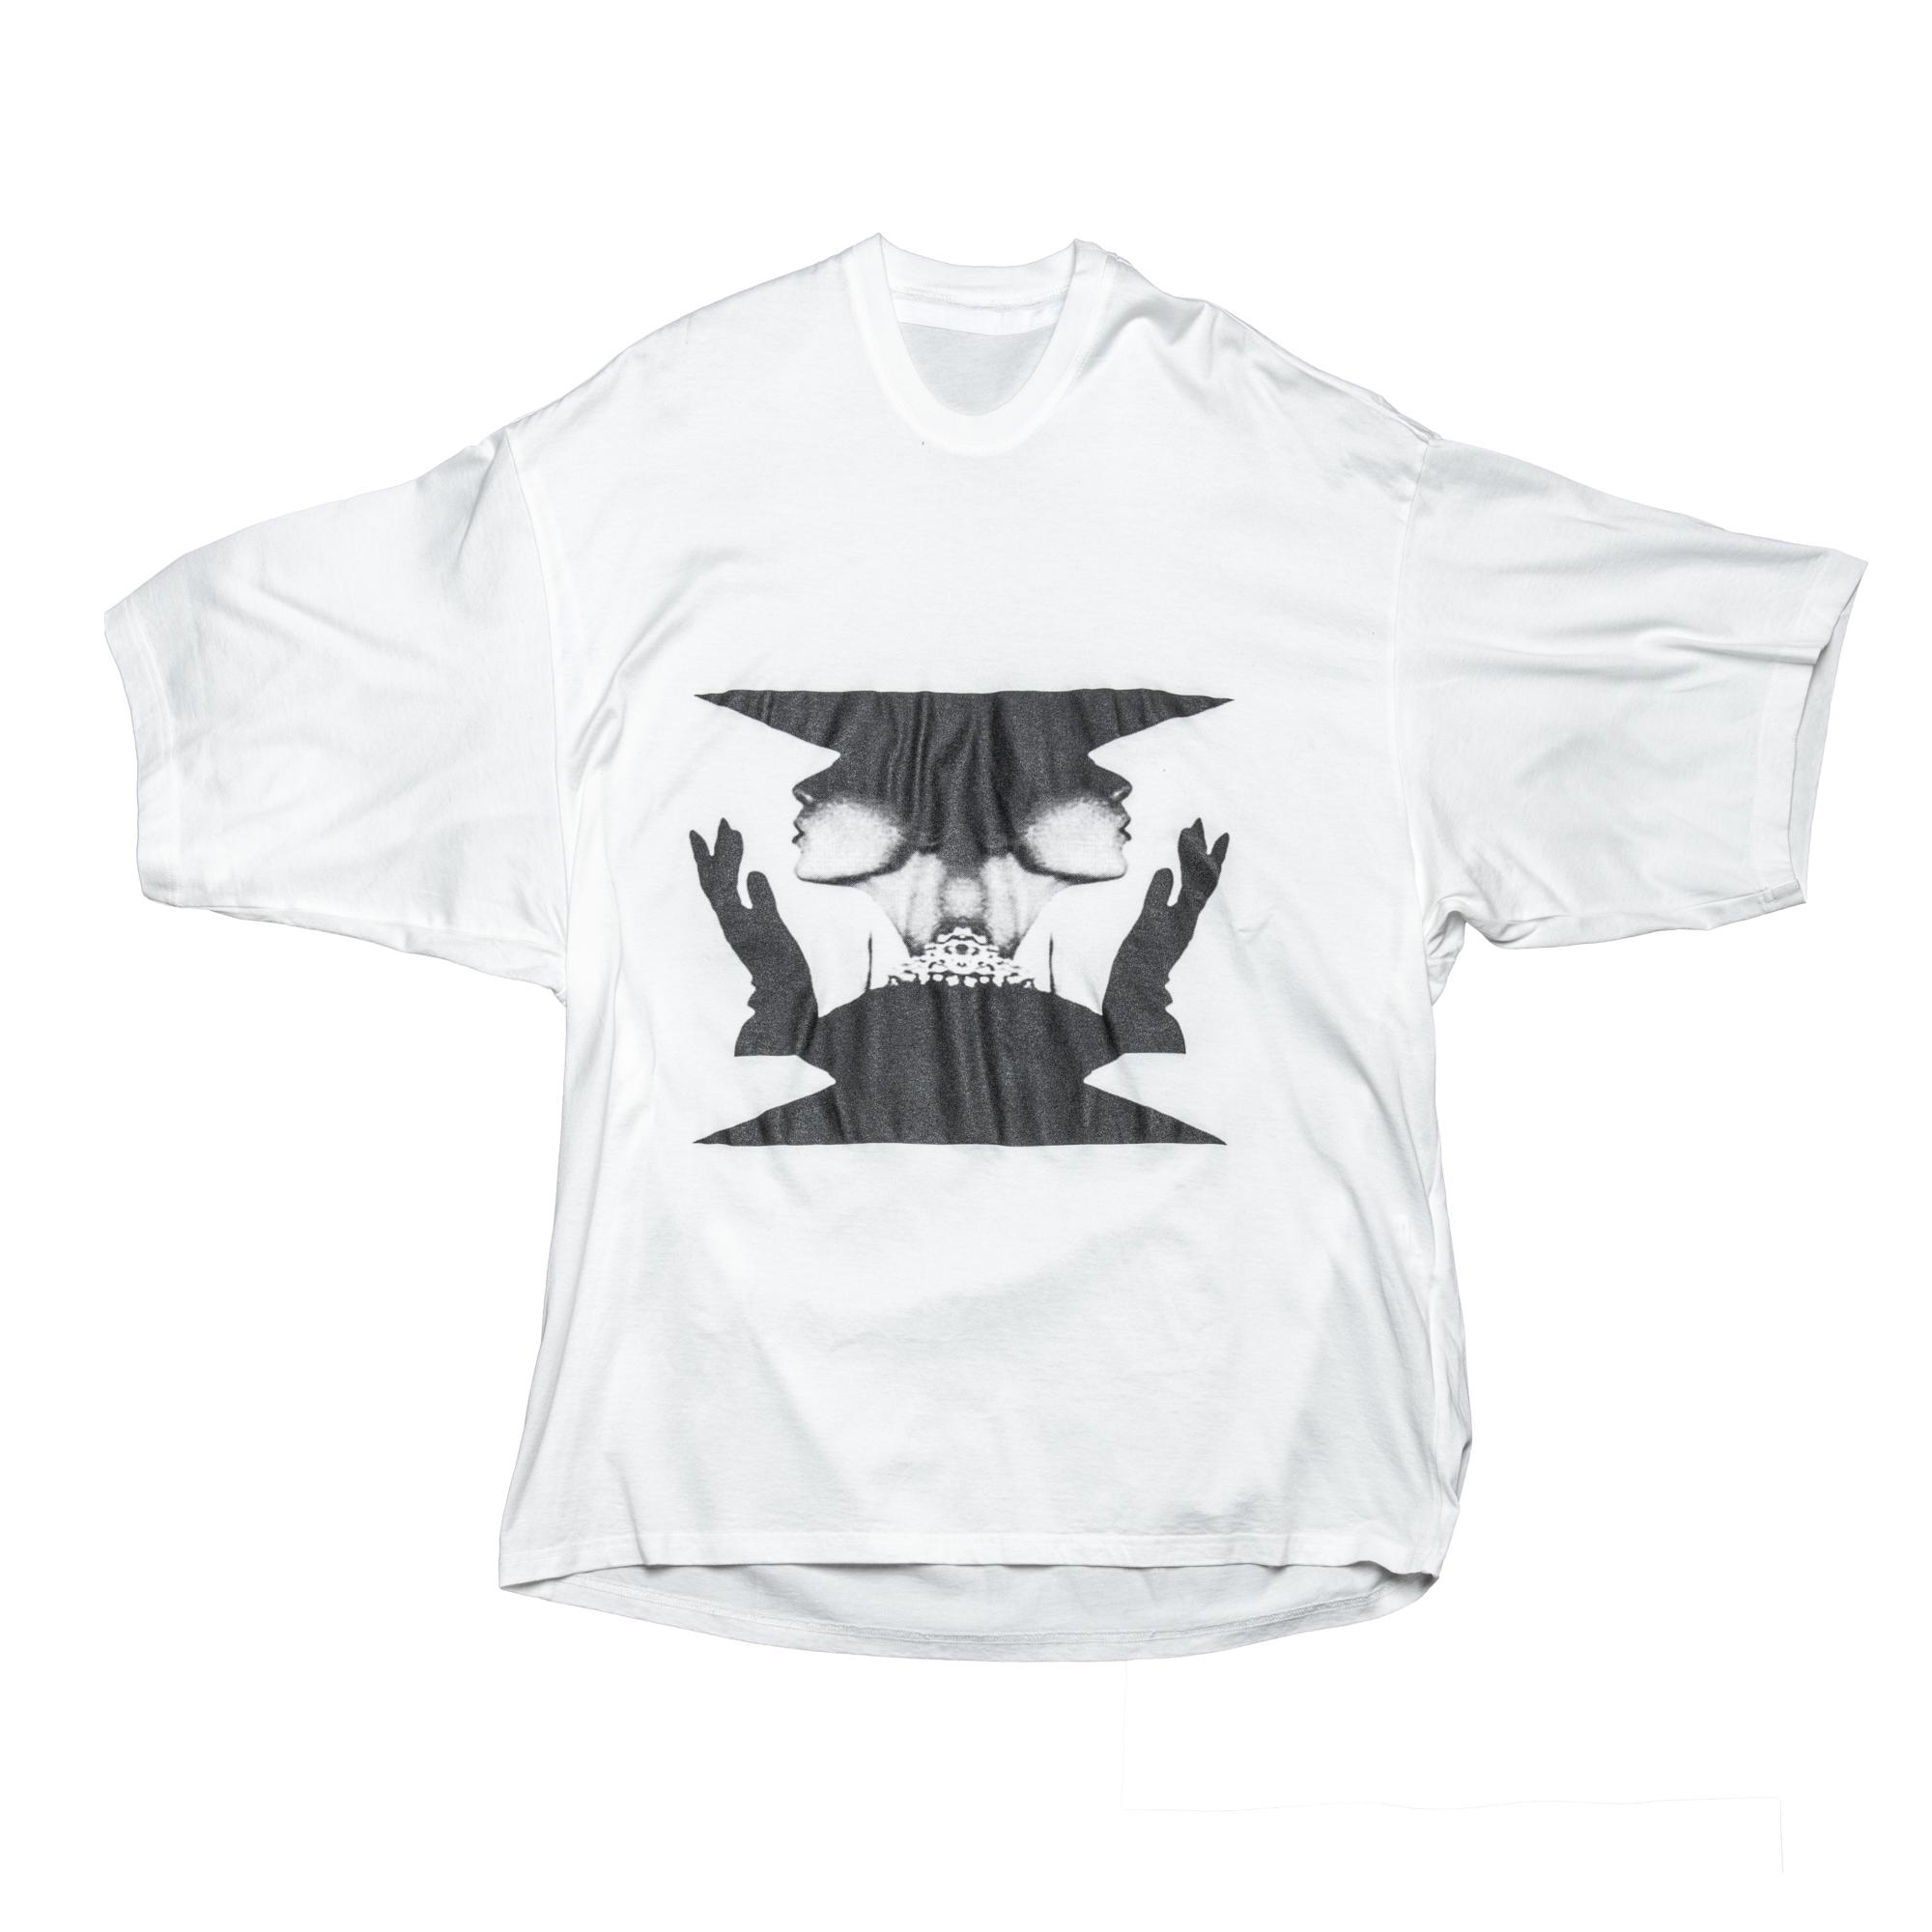 660CPM3-WHITE / SPECULAR Judith BIG Tシャツ